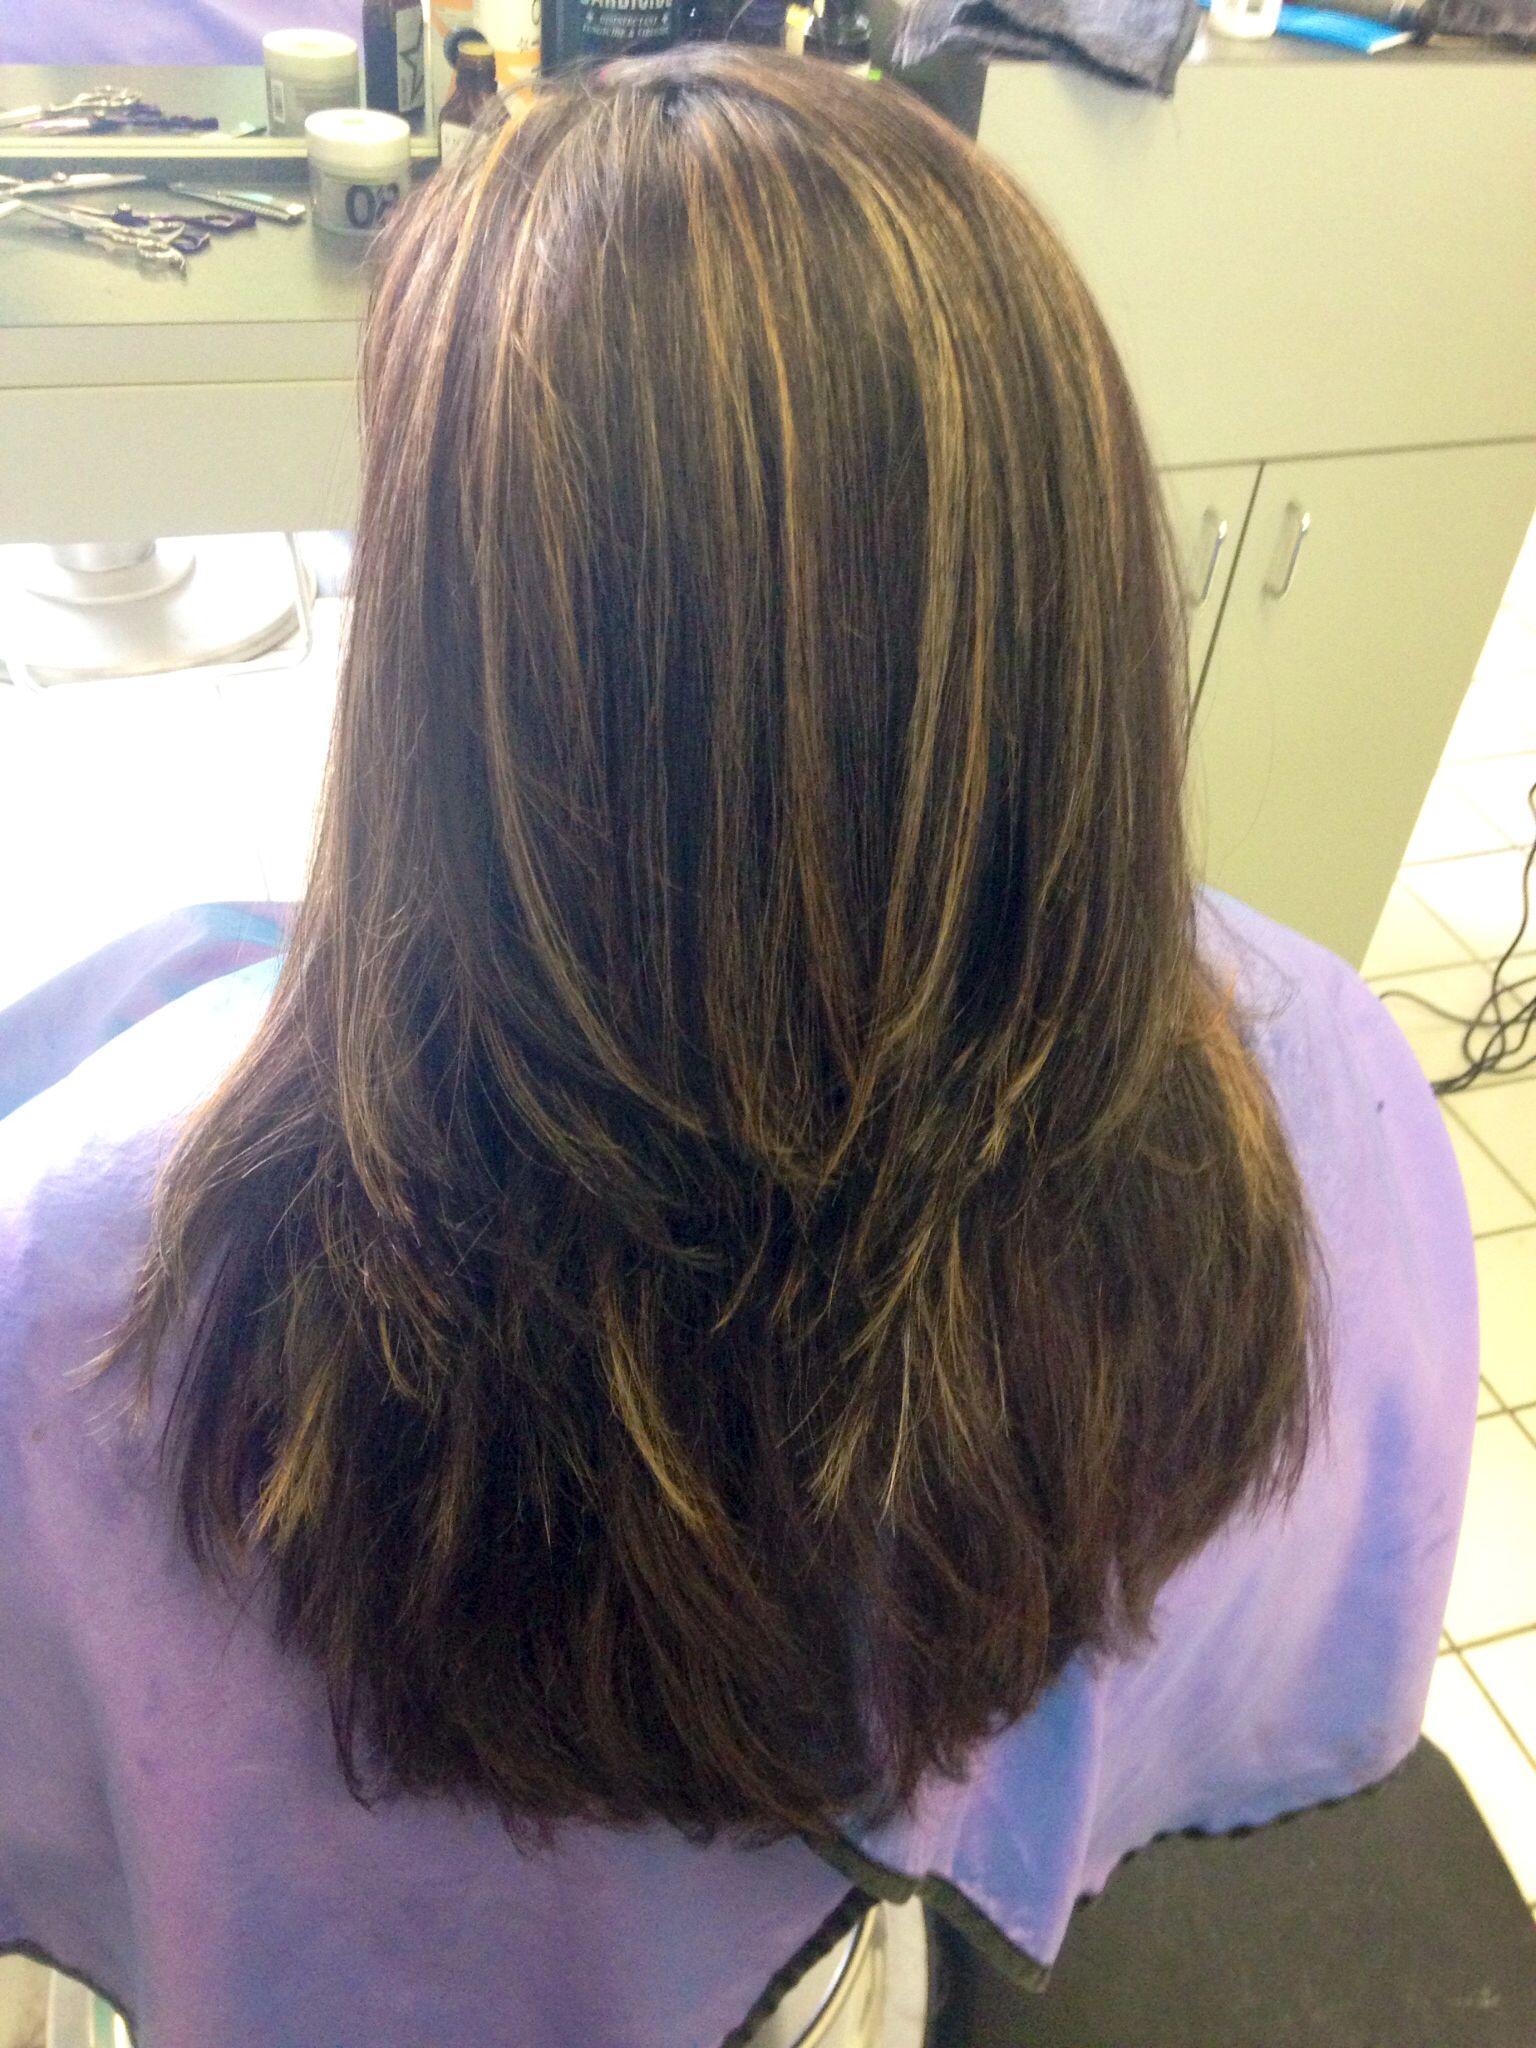 Subtle Blonde And Carmel Highlights In Dark Brown Hair Salon A Go